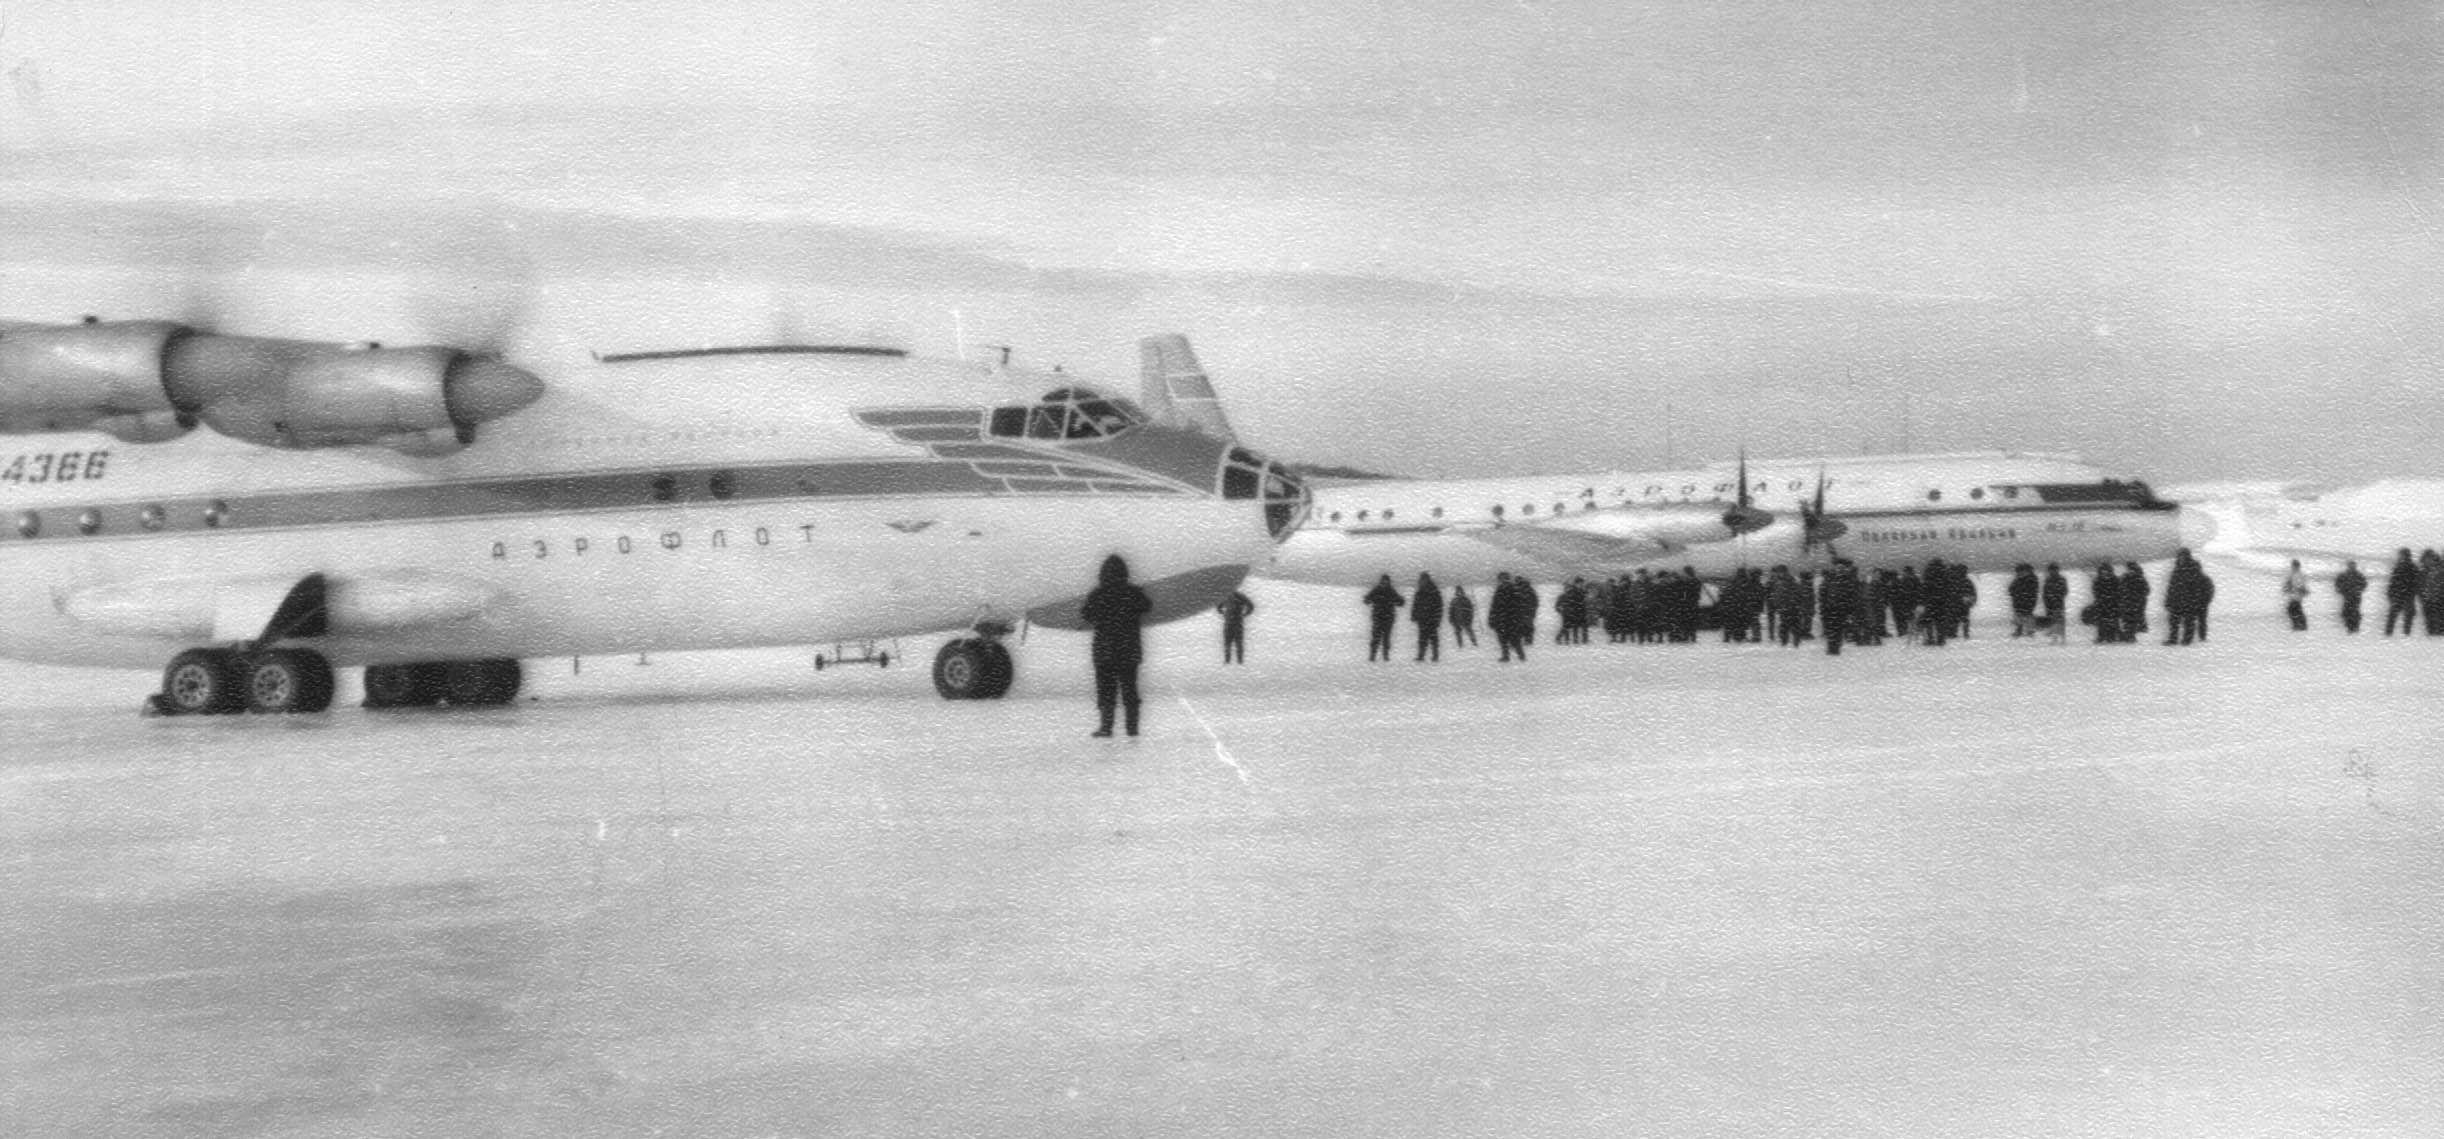 Экспонат #154. Воздушный перелет «Москва — Антарктида» (1961 — 1962)